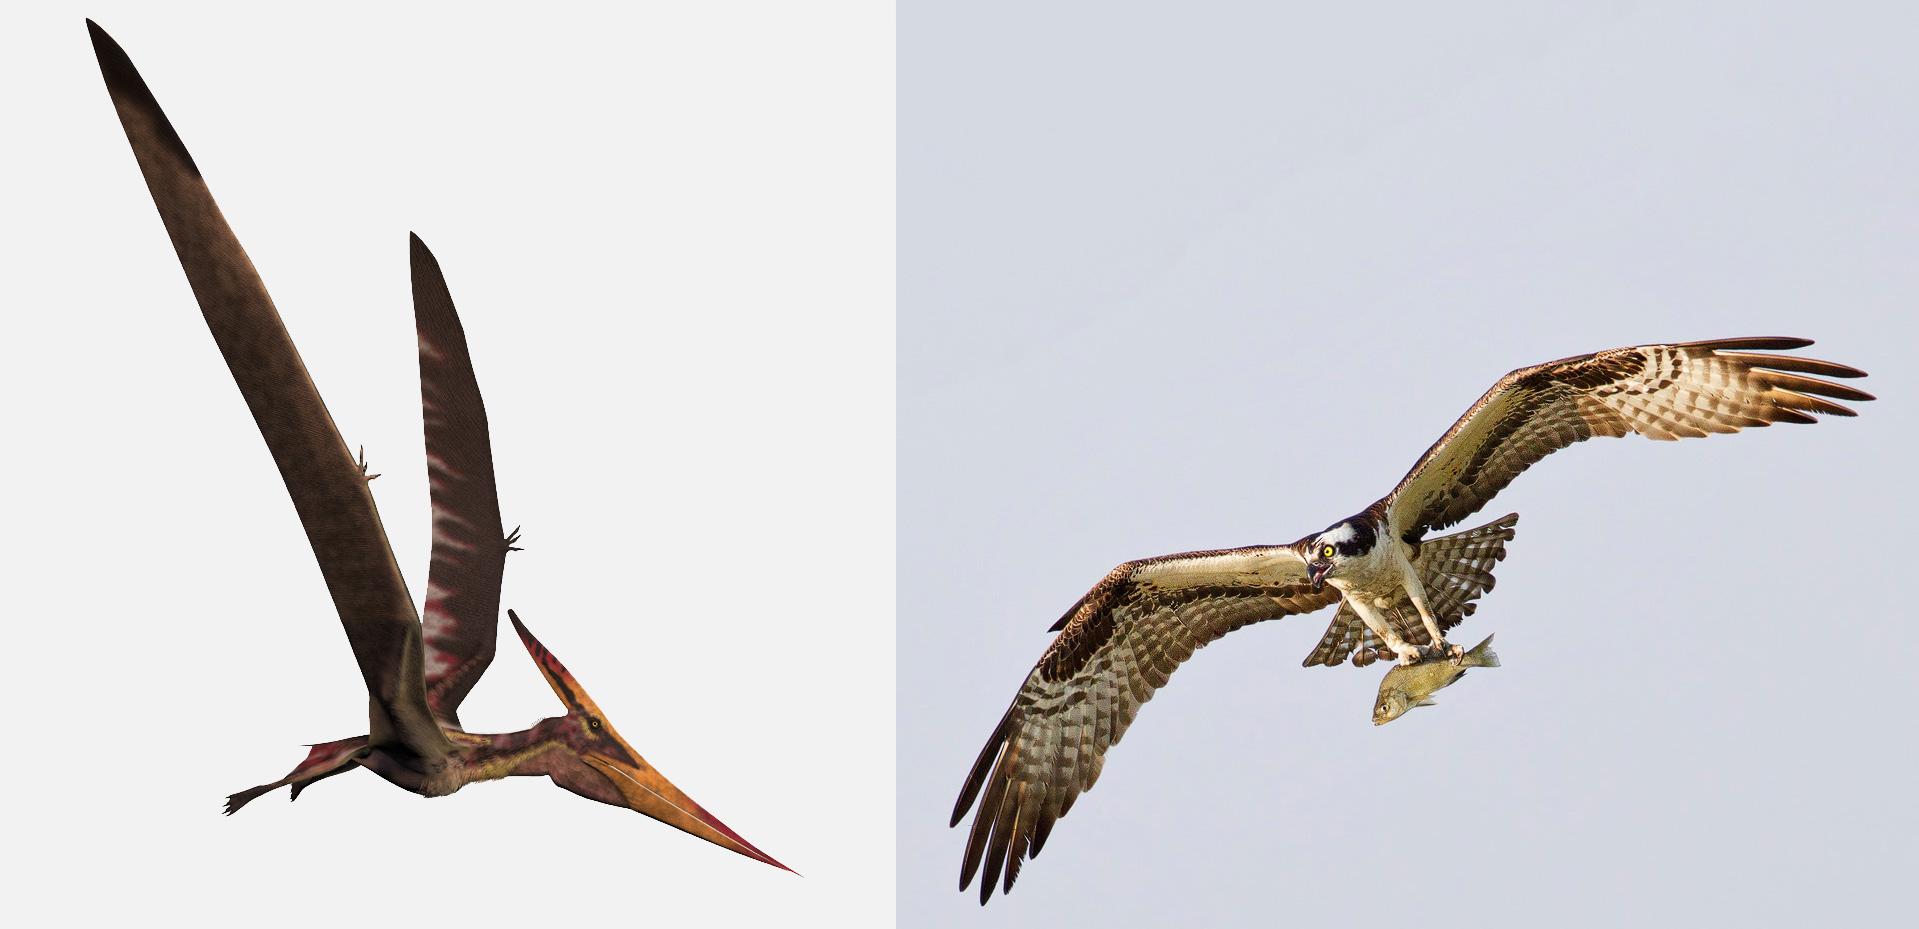 Pteranodon and Osprey. Illustration: Stocktrek Images, Inc./Alamy, photo: Nick Palmieri/Audubon Photography Awards